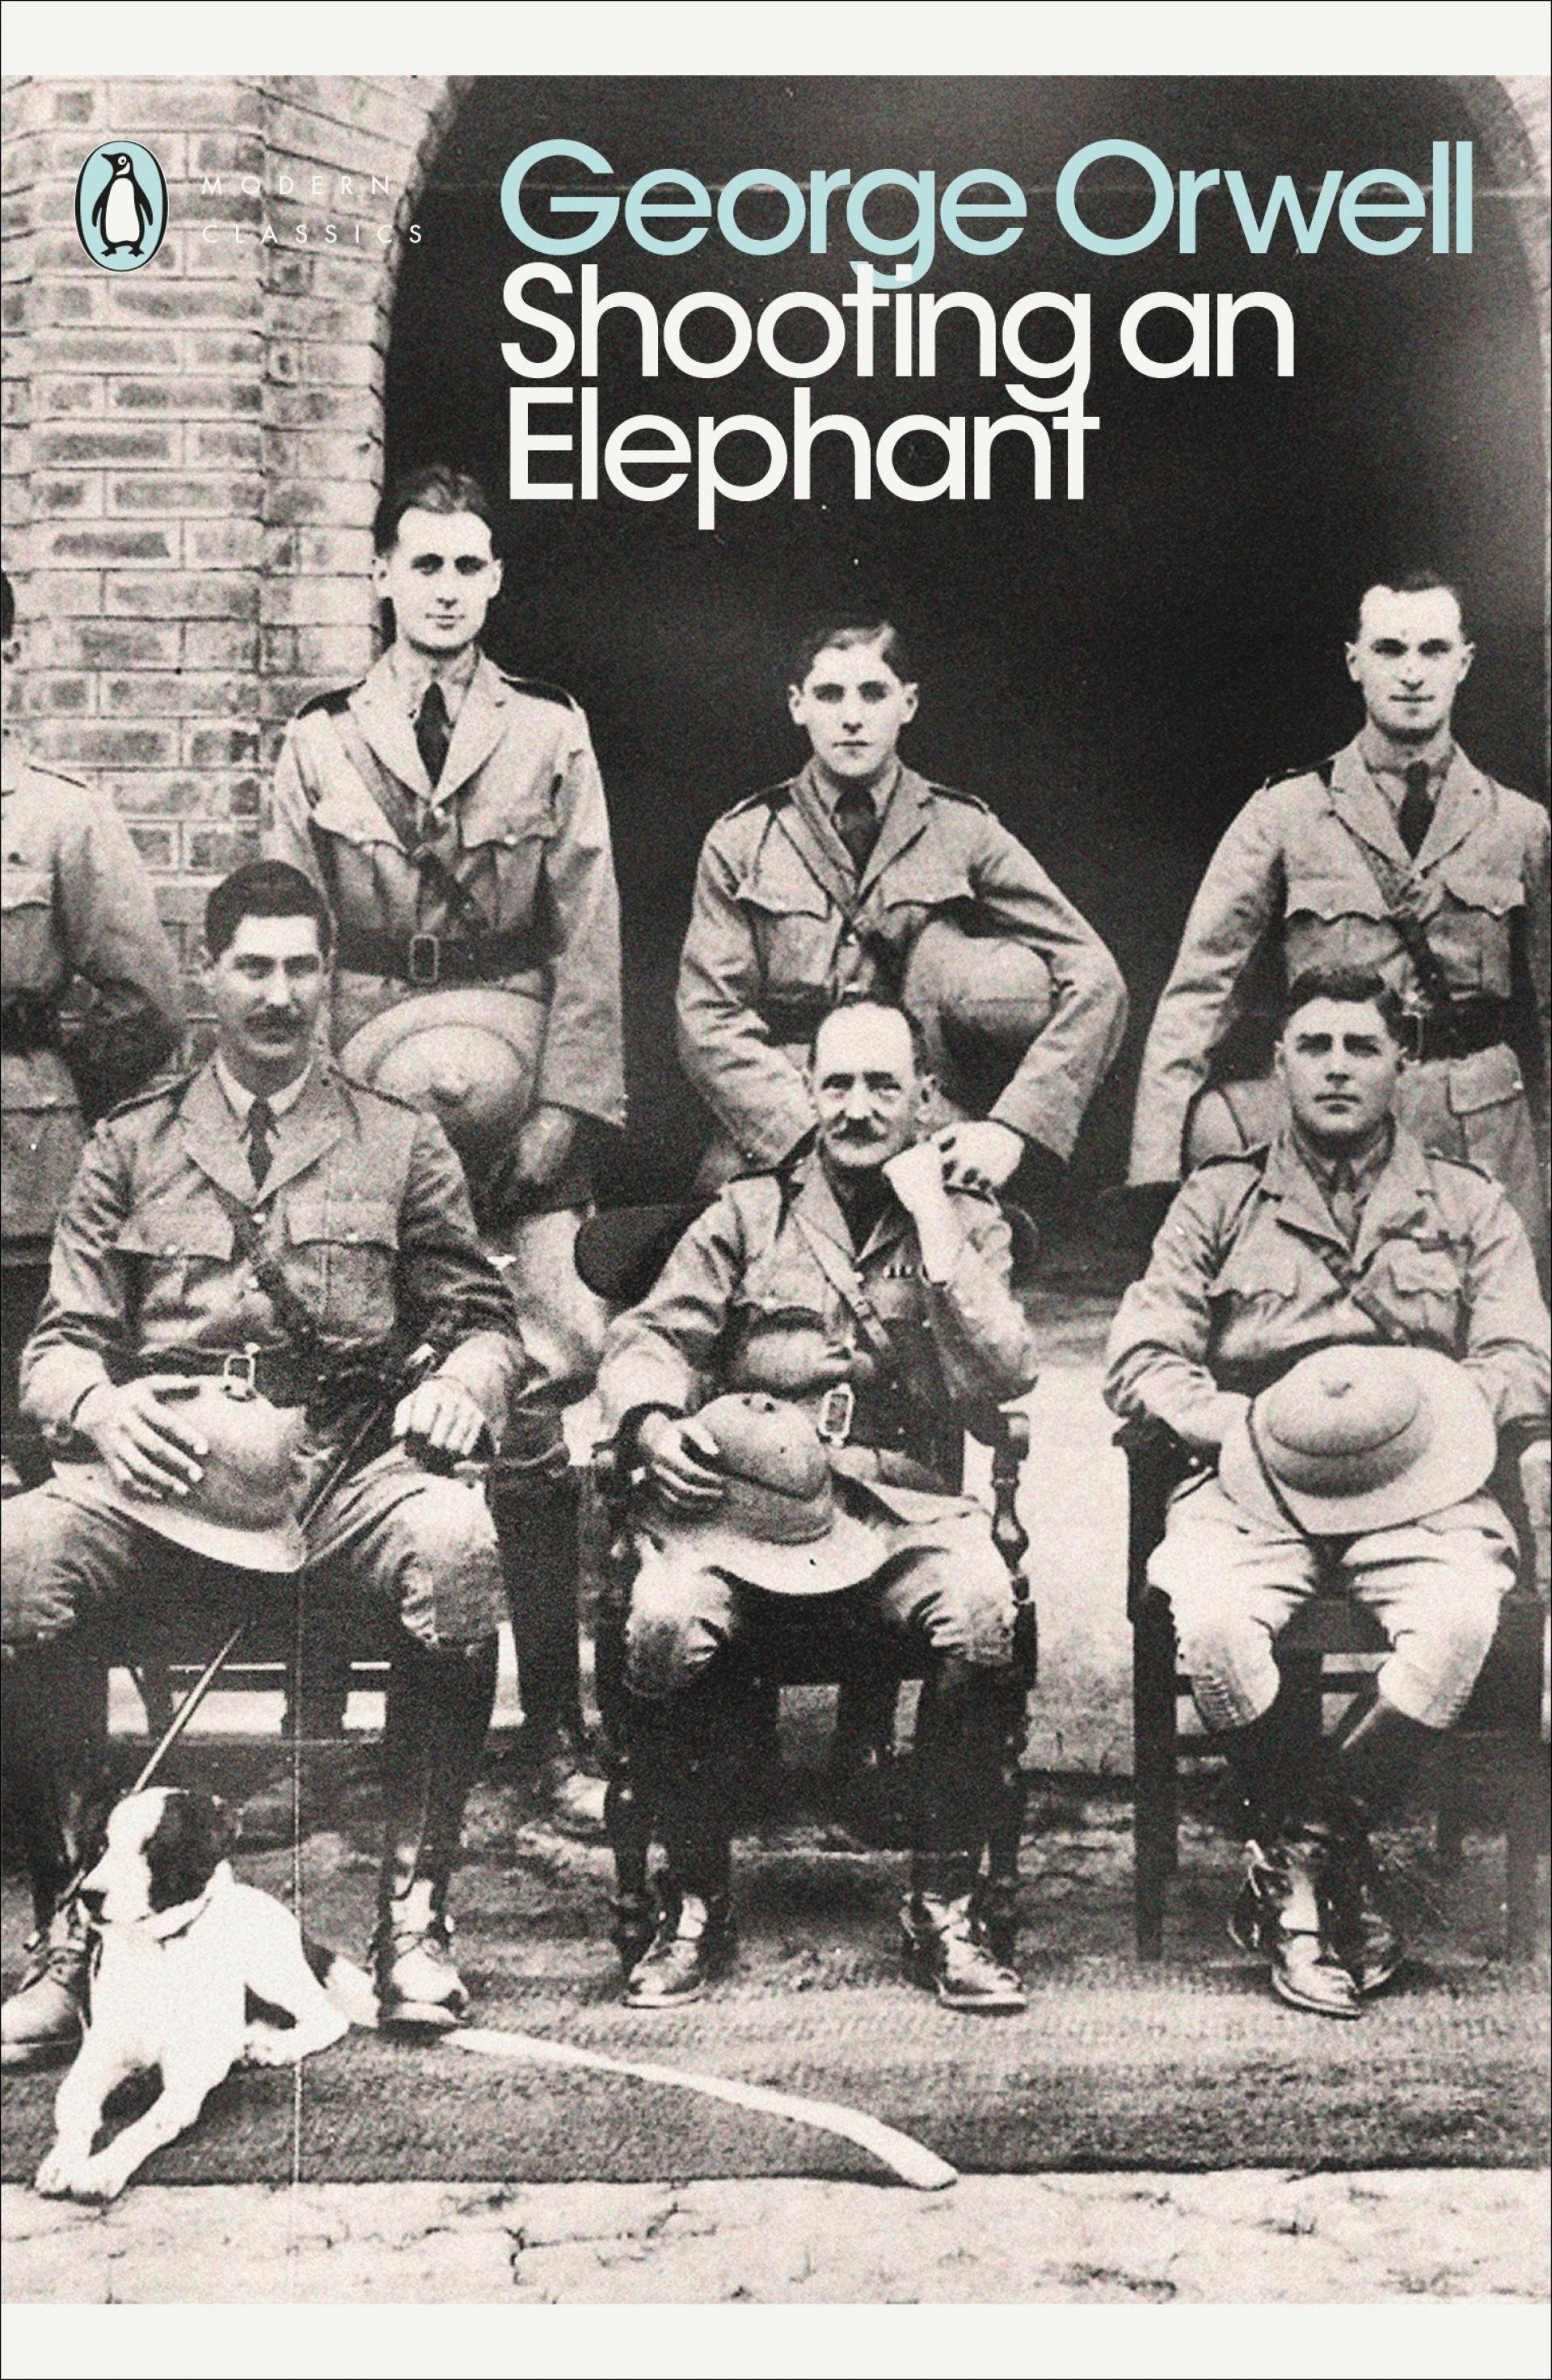 018 Essay Example George Orwell Essays Frightening Everyman's Library Summary Bookshop Memories 1920